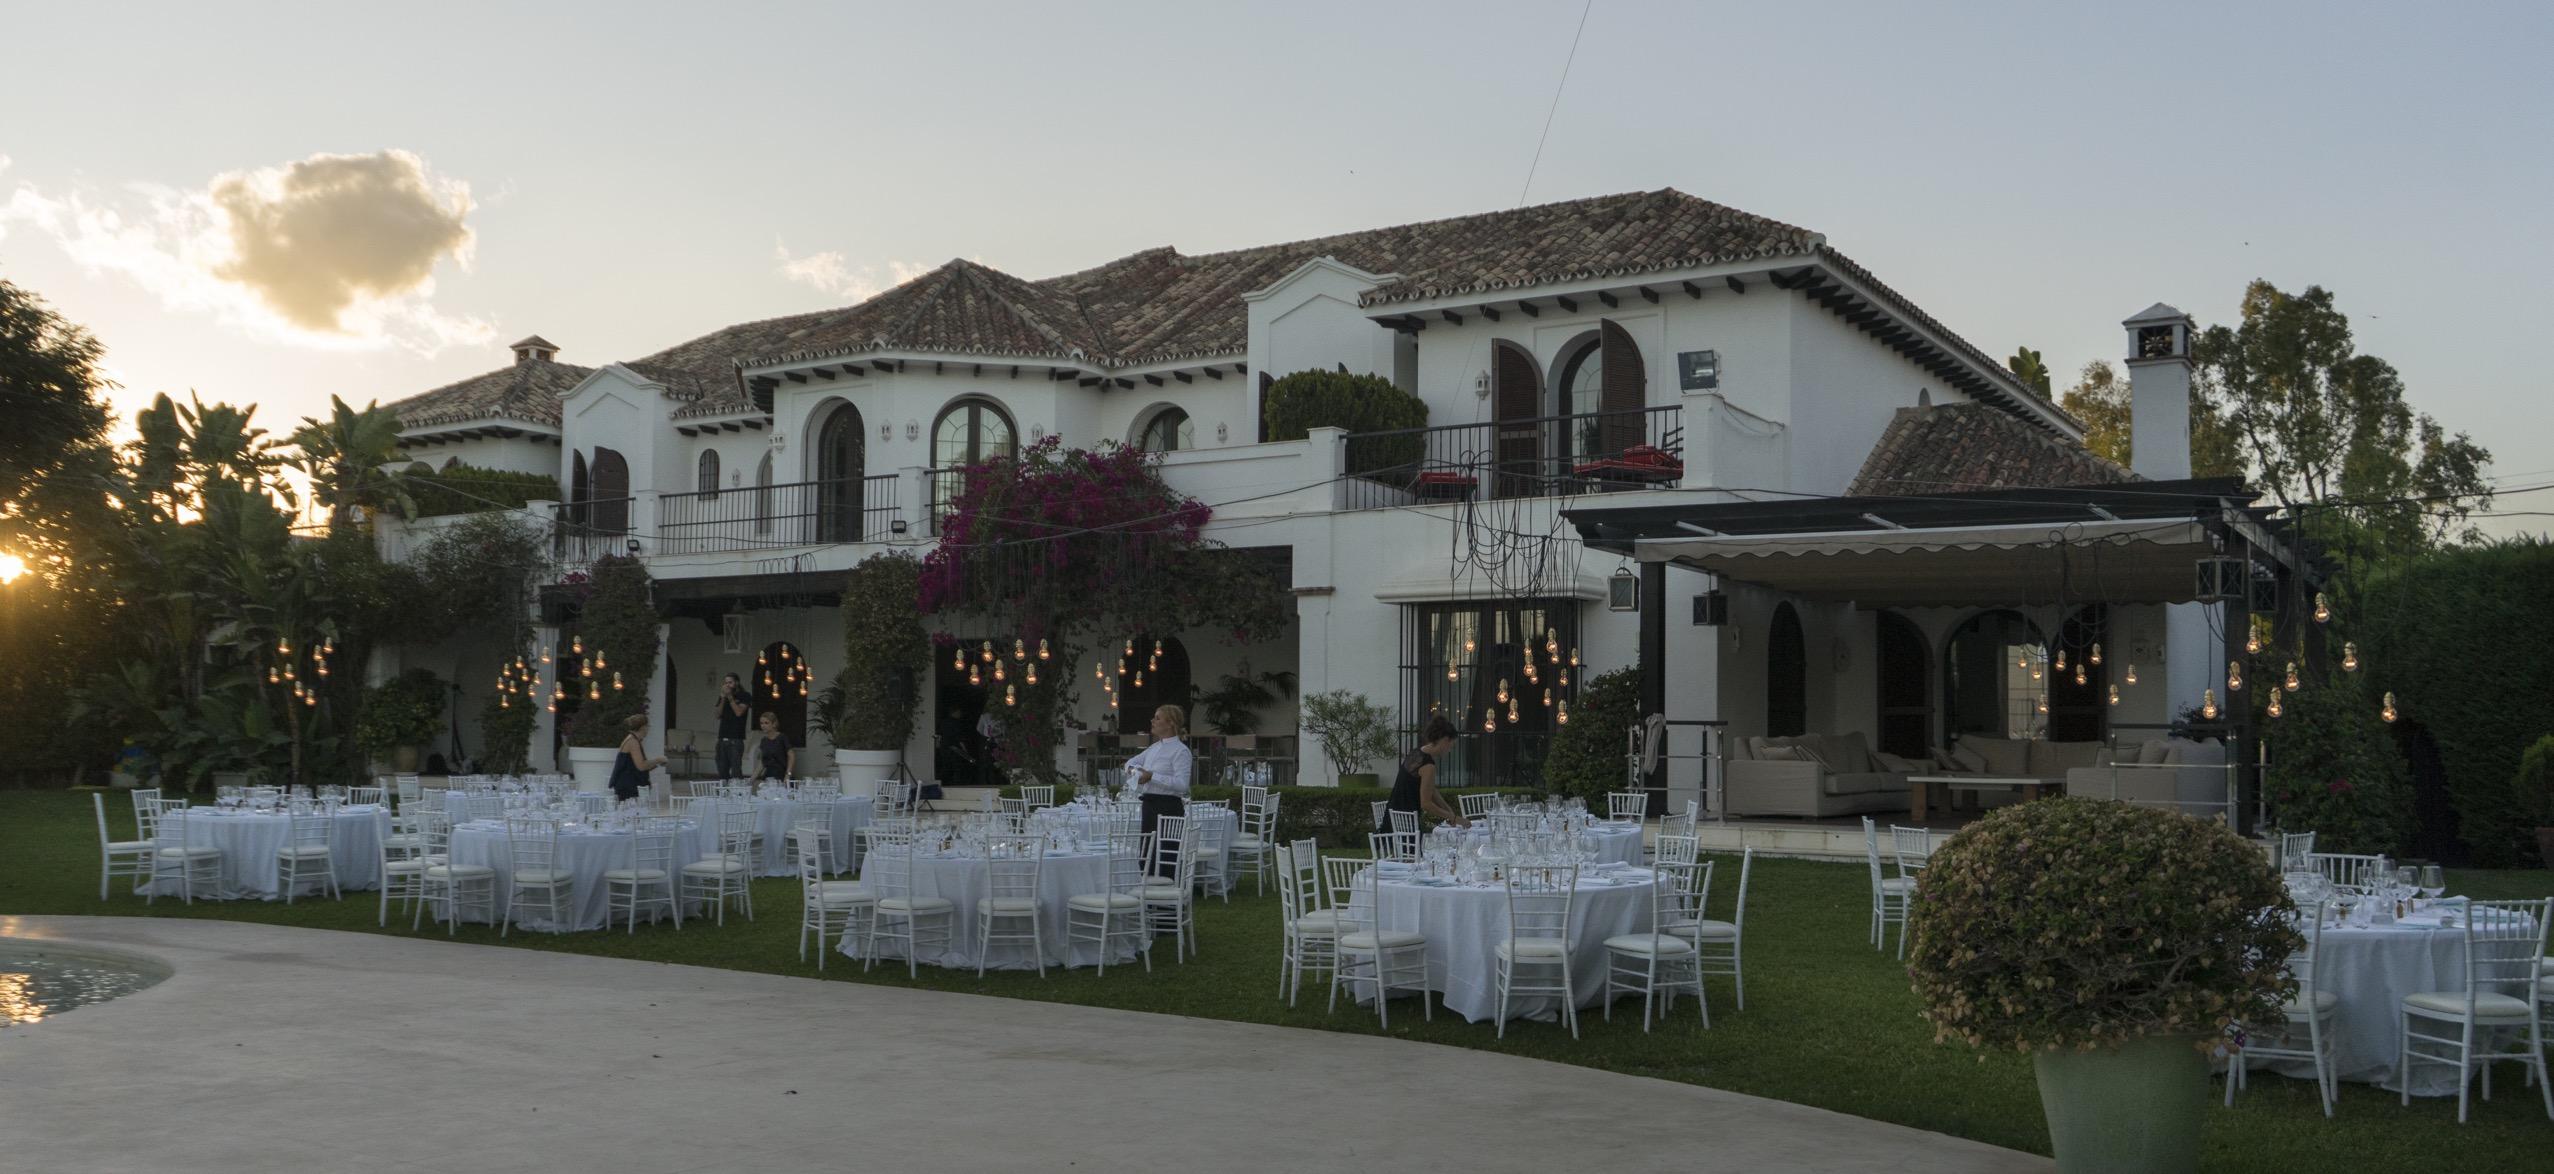 Si-Quiero-Wedding-Planner-By-Sira-Antequera-Bodas-Málaga-Marbella-Miami- Nicole-Guille-4